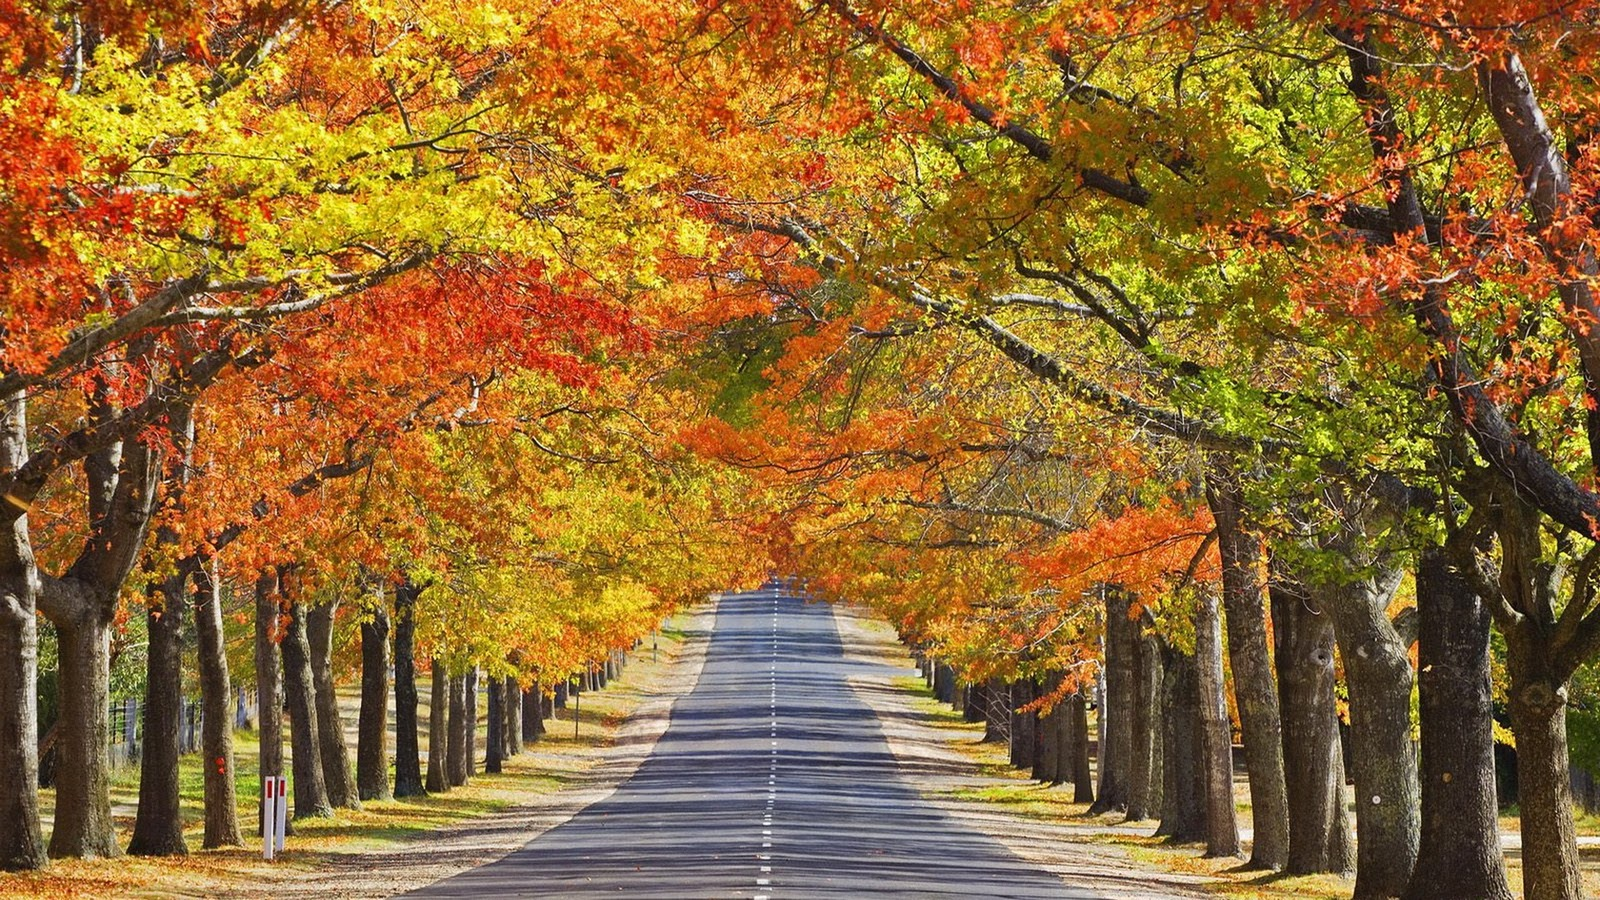 autumn season wallpaper hd beautiful autumn season wallpaper hd 1600x900